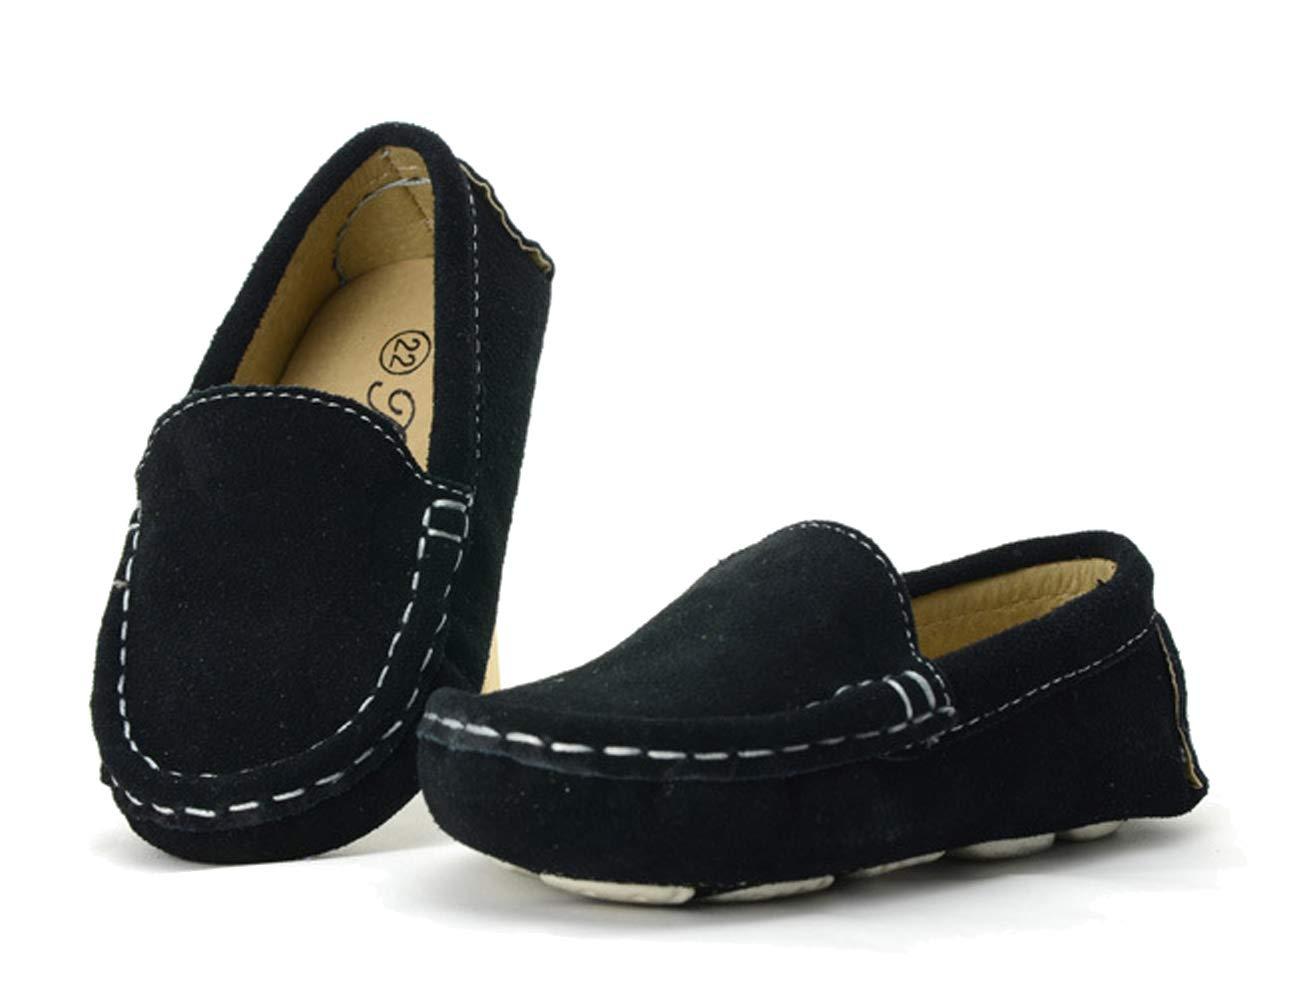 WUIWUIYU Boys' Girls' Suede Slip-On Loafers Flats Moccasins Comfort Casual Shoes Black Size 7 M by WUIWUIYU (Image #2)